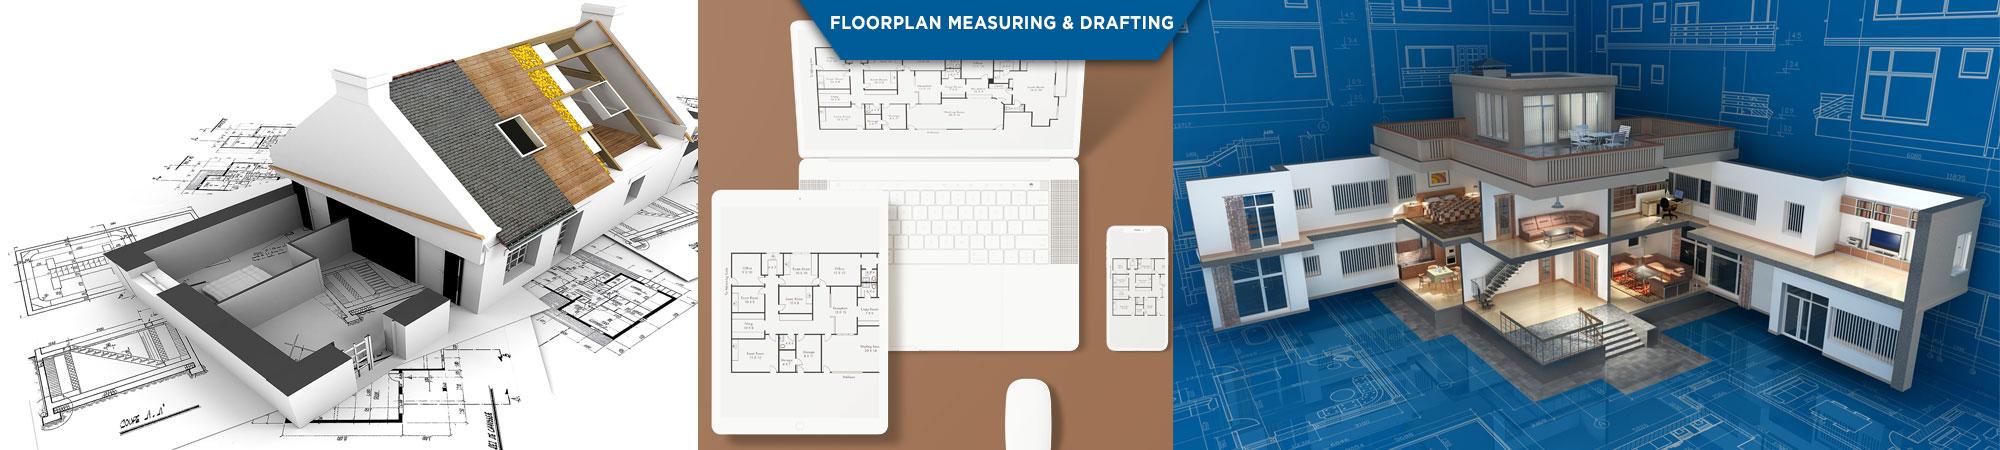 floorplan measuring drafting